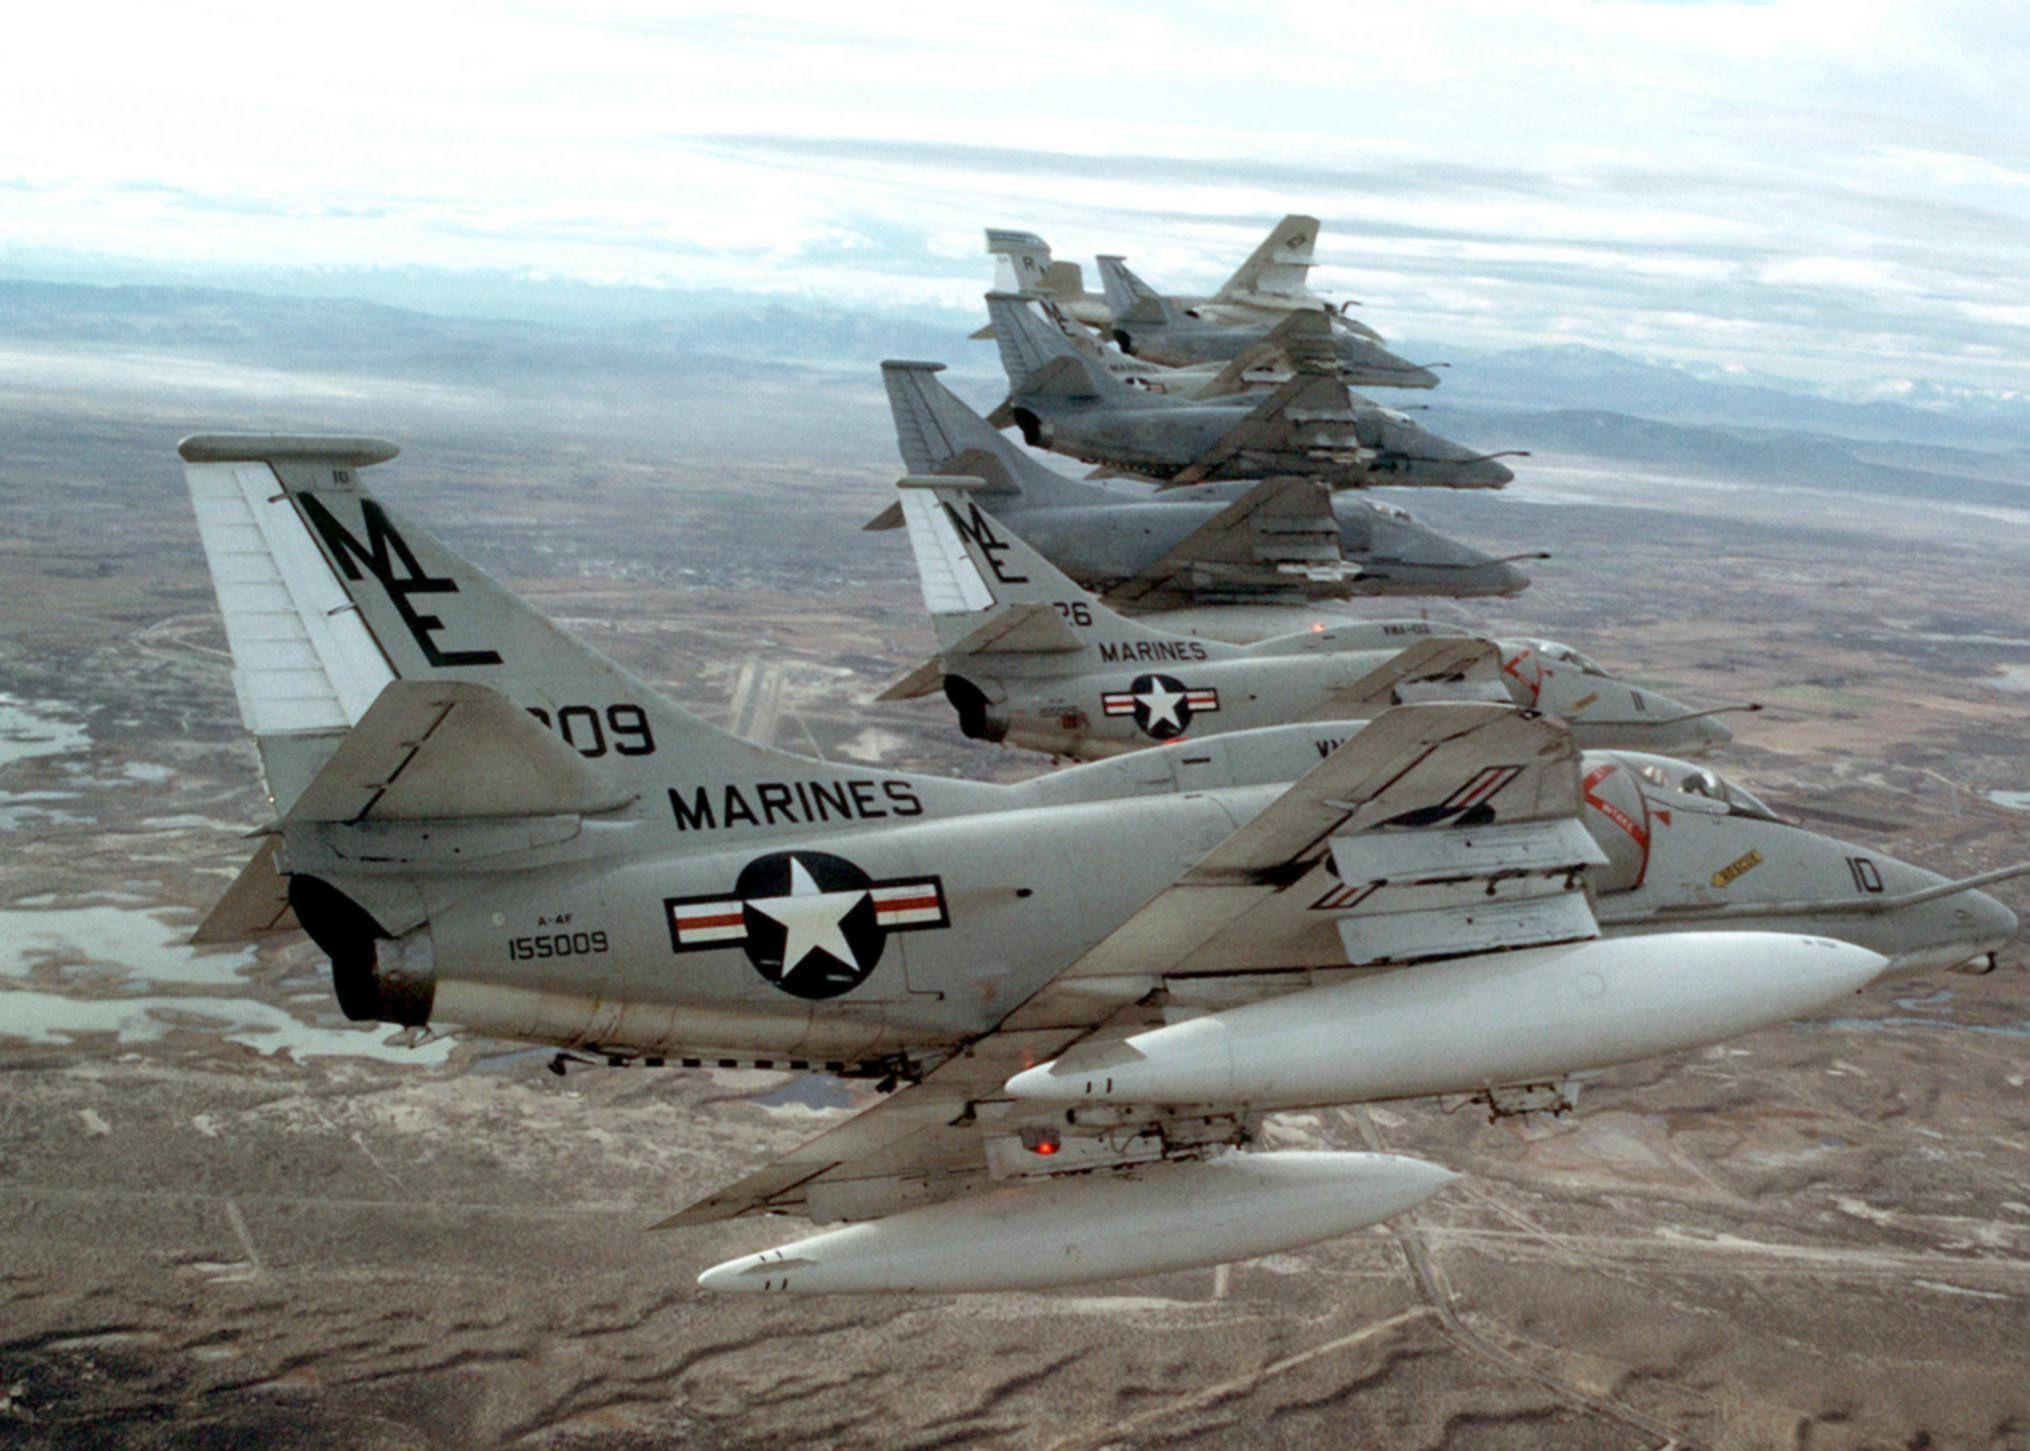 Six U.S. Marine Corps Reserve Douglas A4F Skyhawk